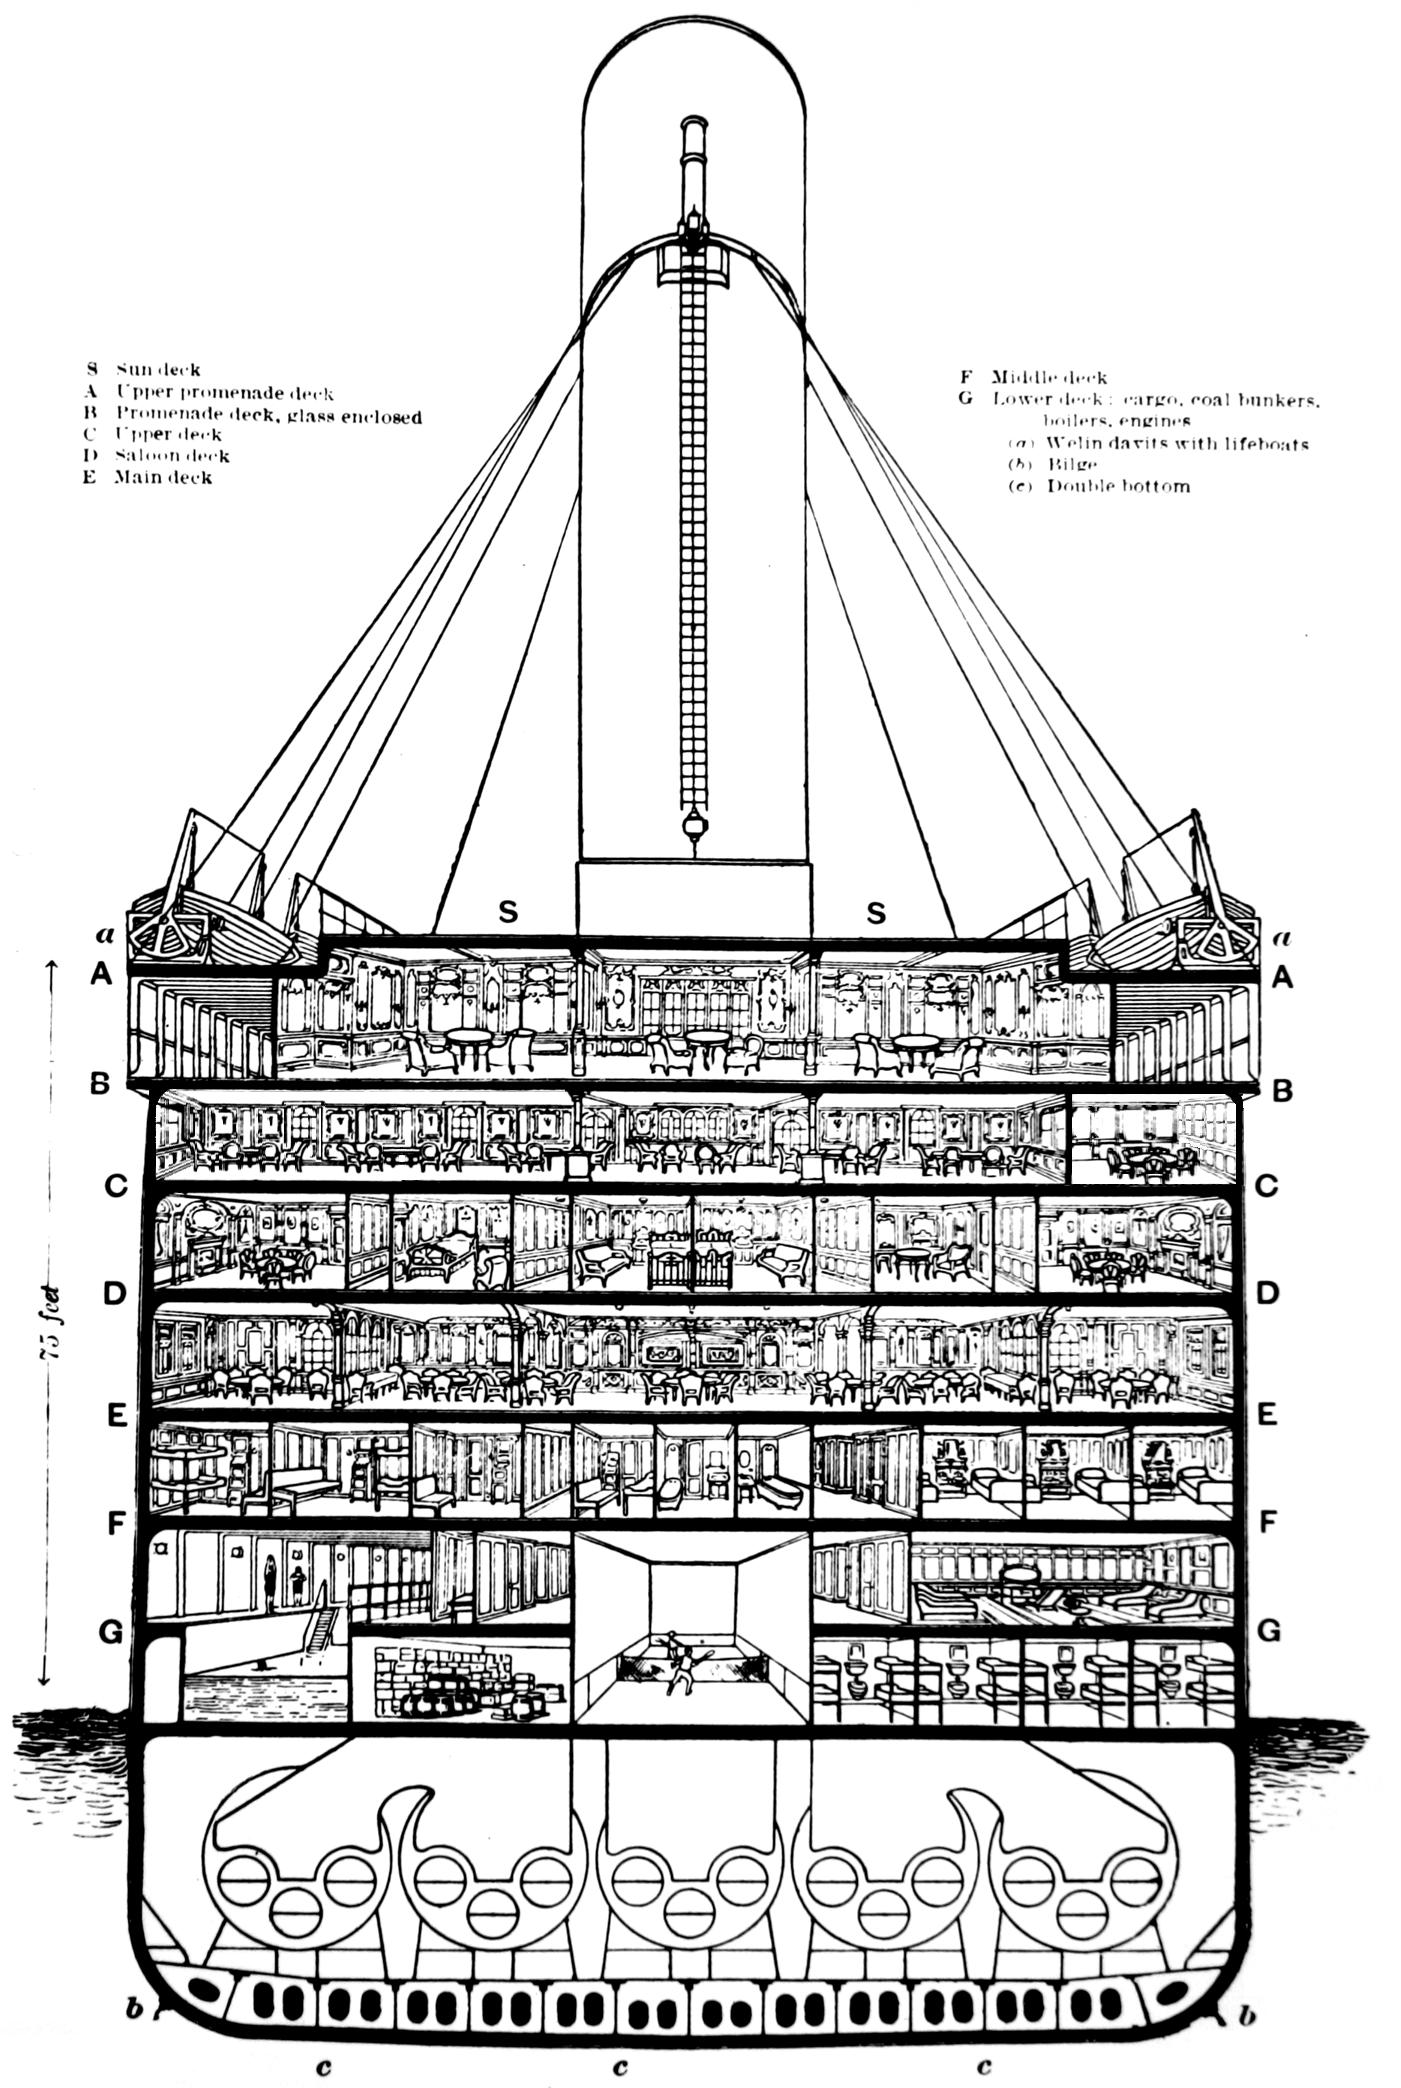 Filetitanic Cutaway Diagram Wikimedia Commons F G Block